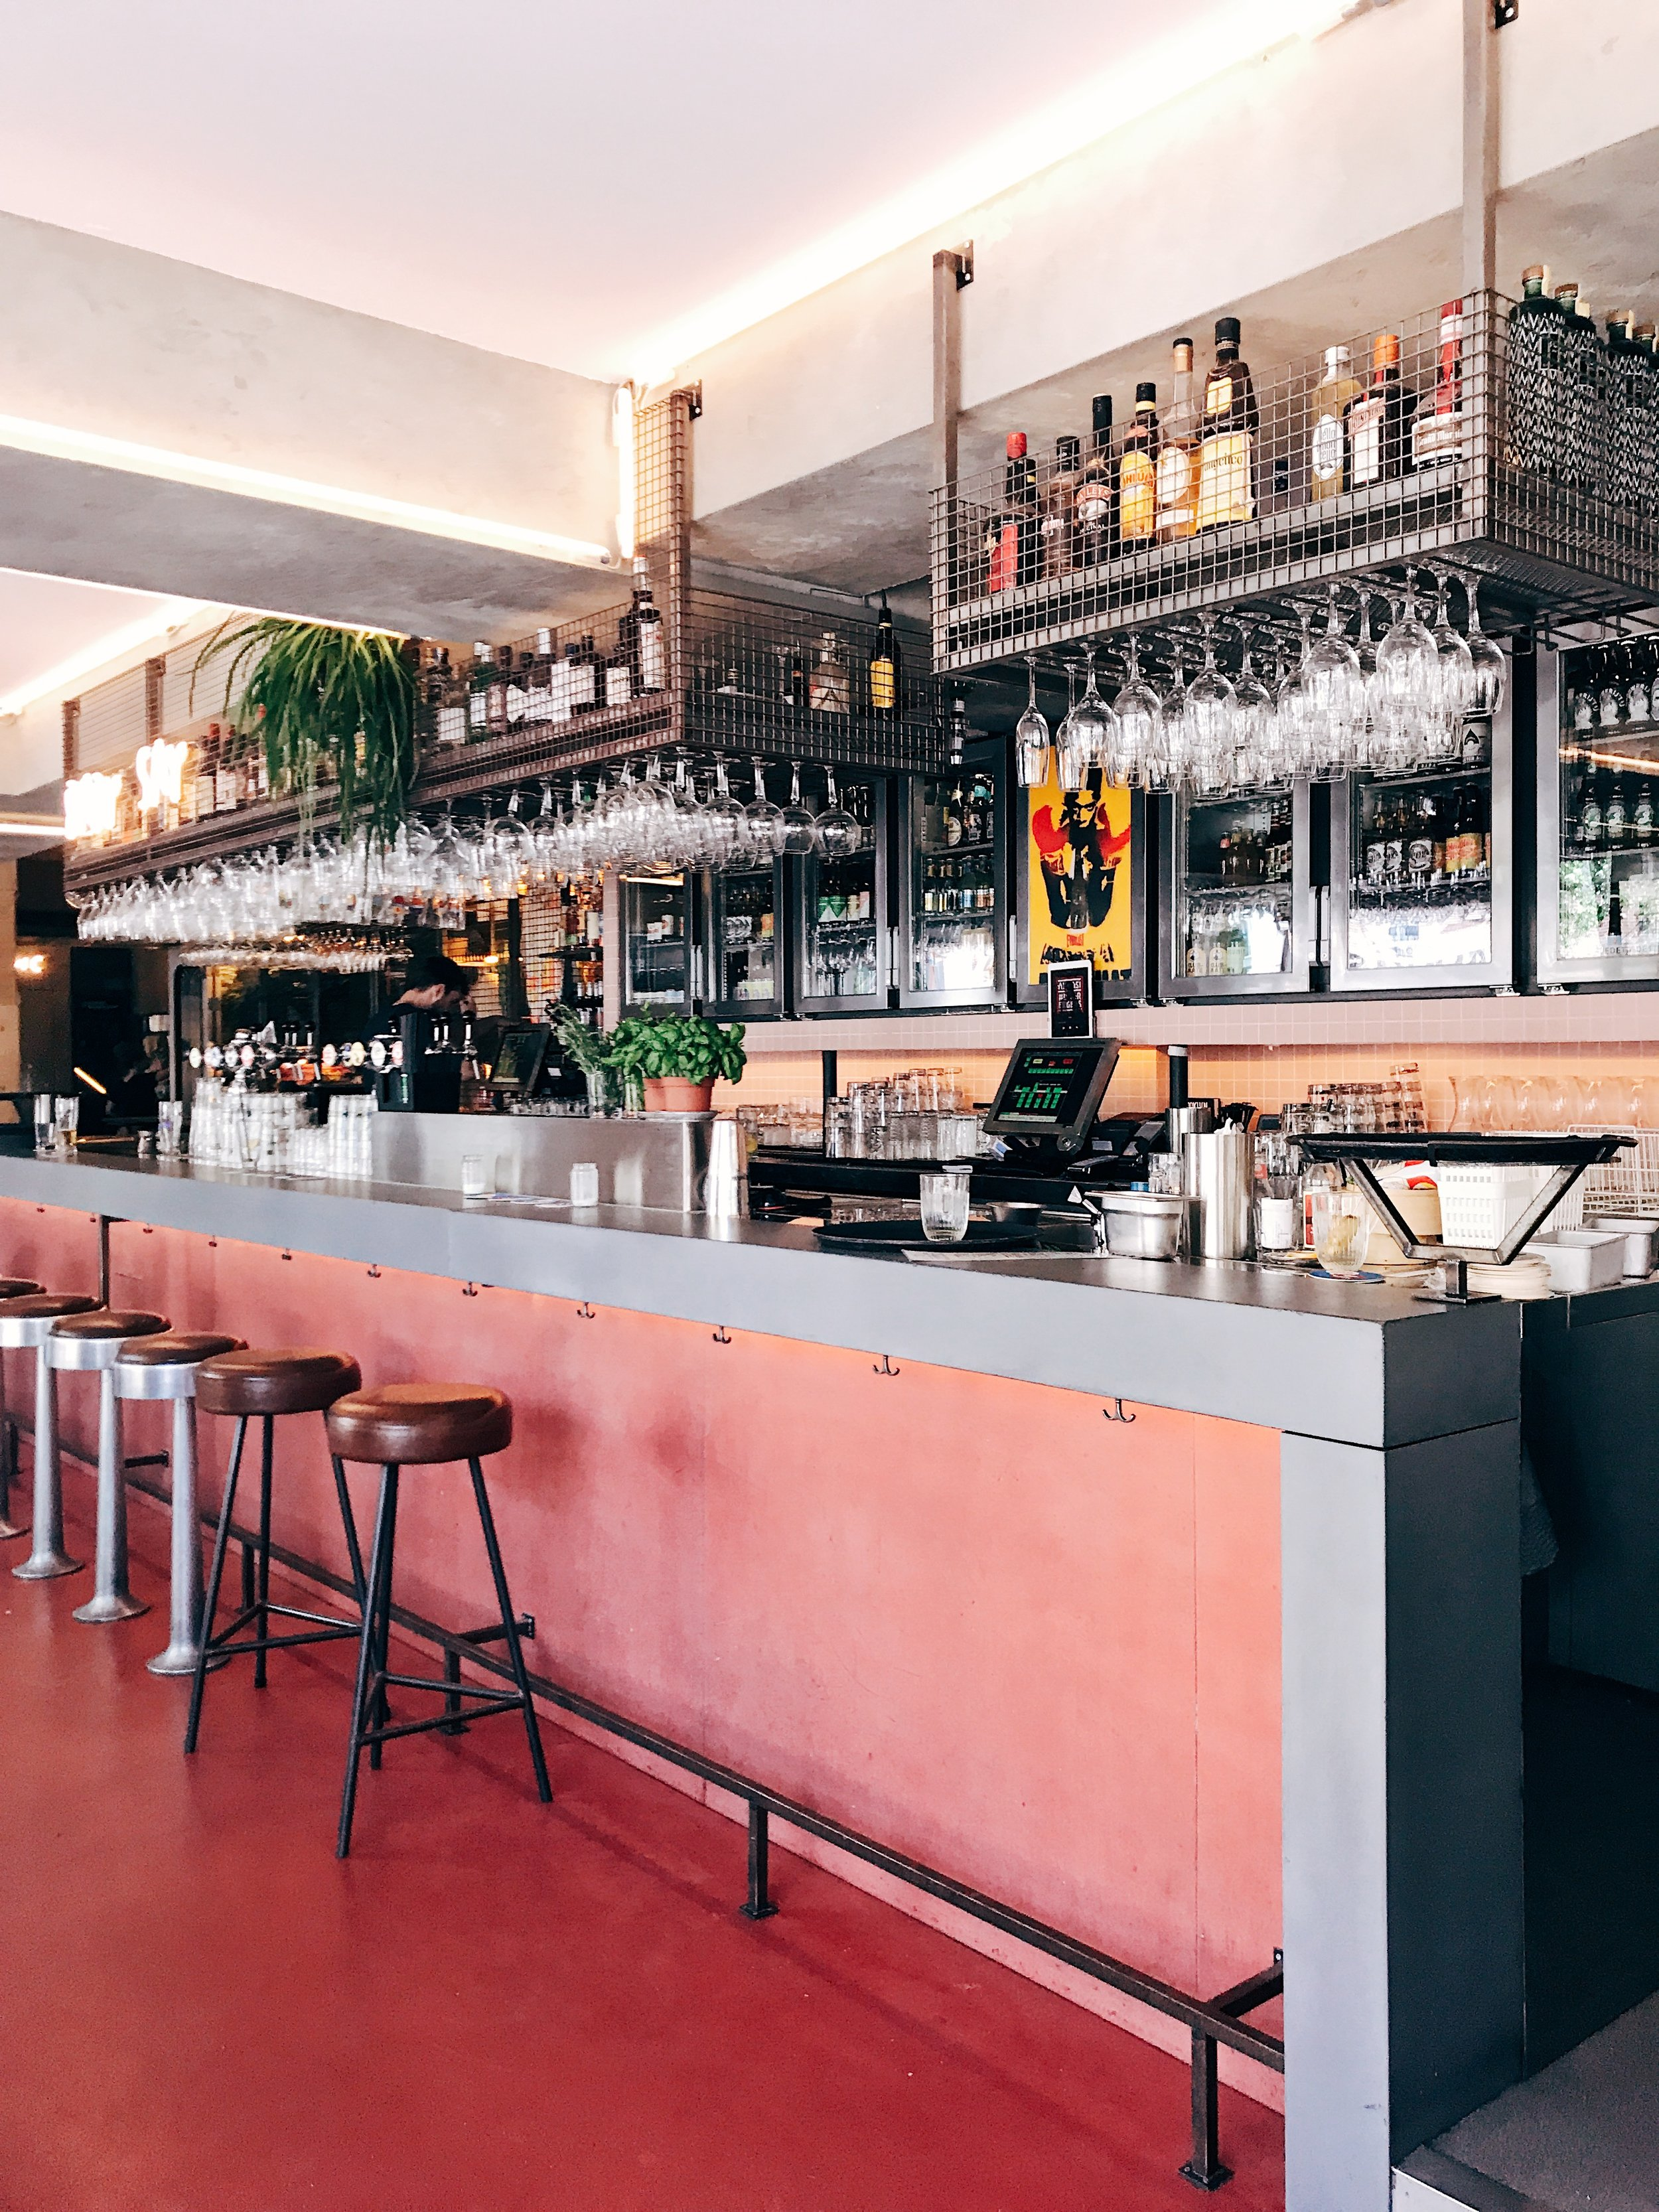 Image: Amsterdam: Beyond the Tourist Sites - Bar Basquiat